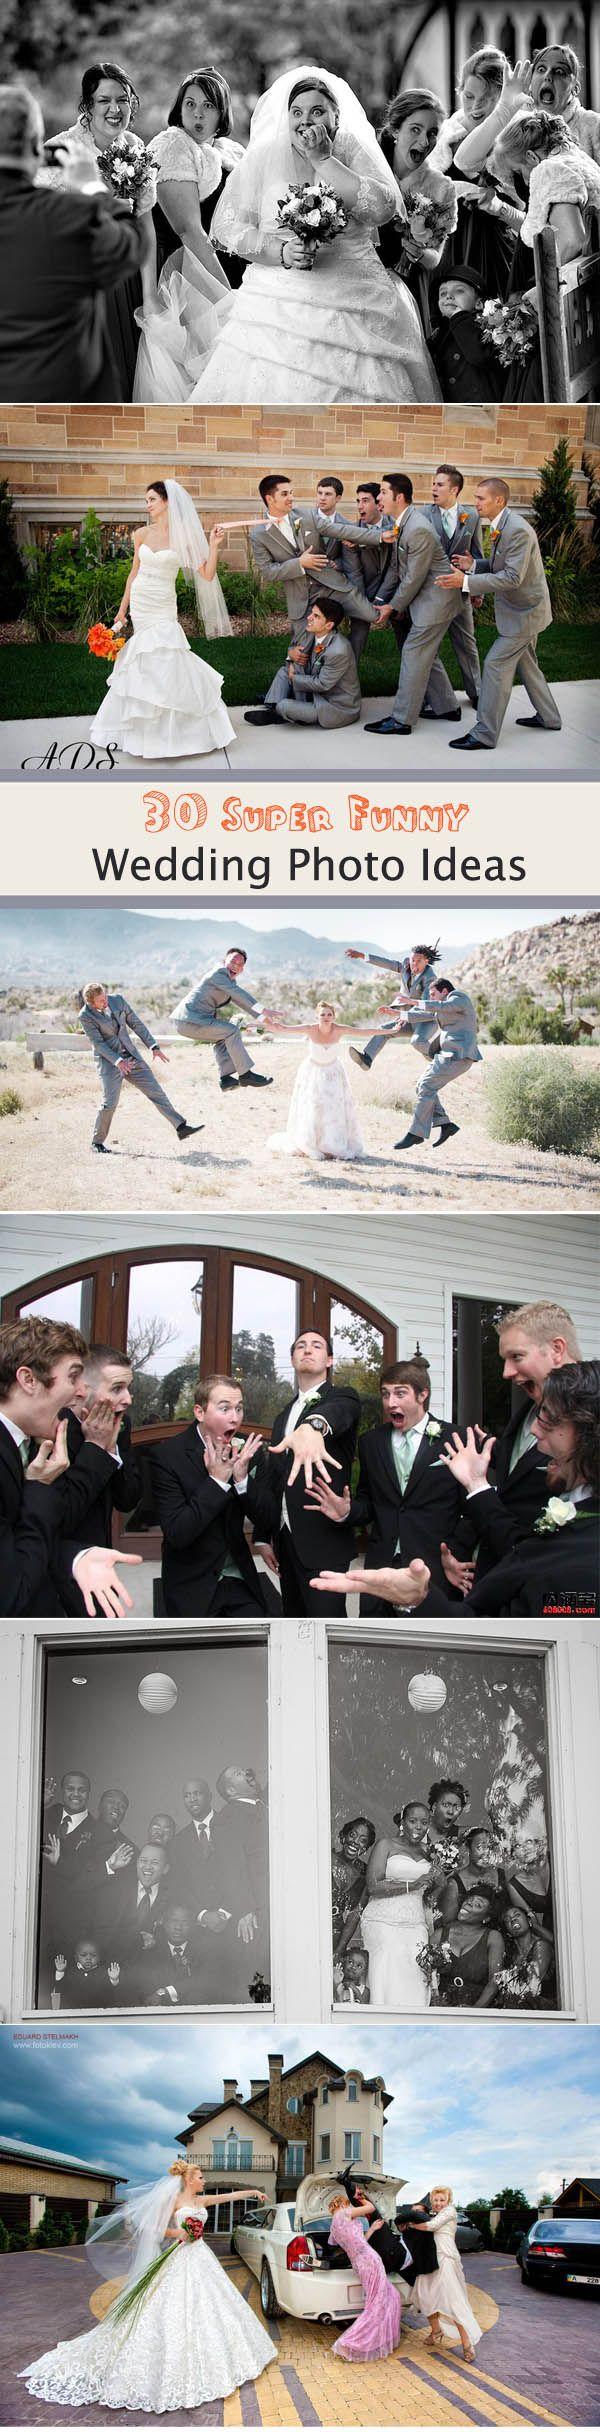 30 super funny wedding photo ideas